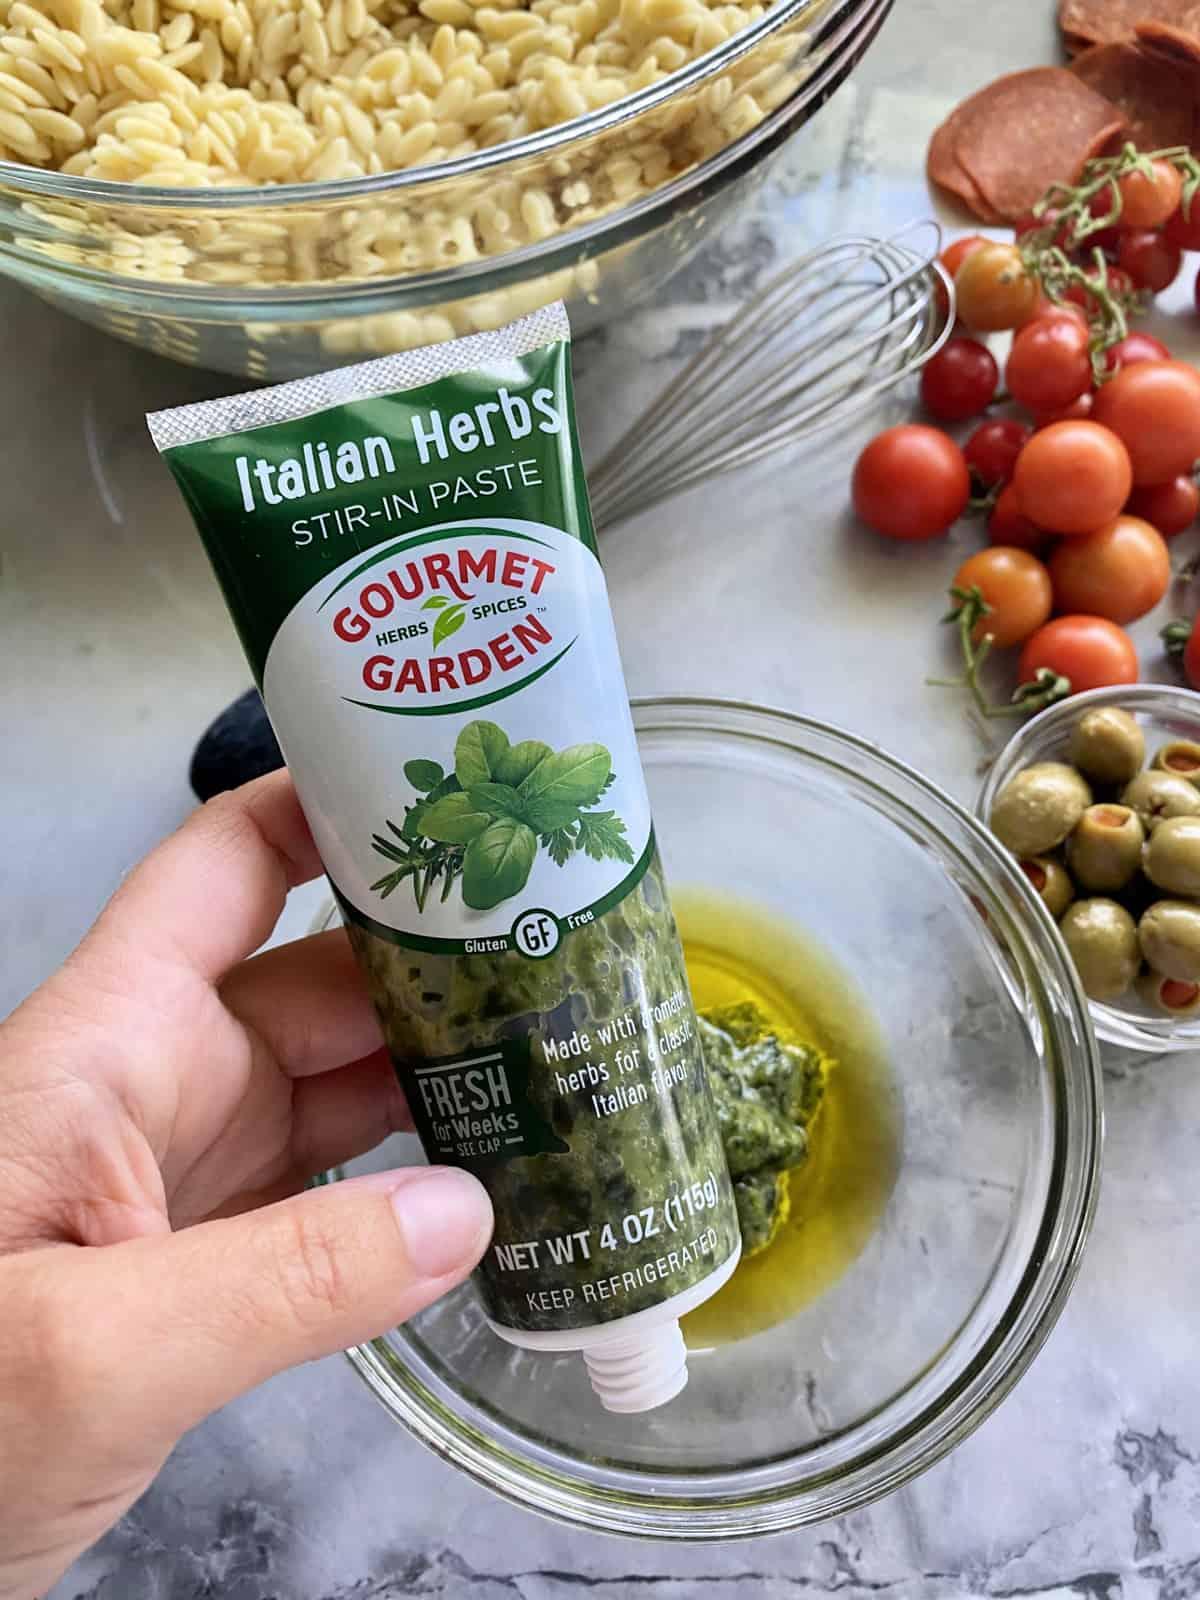 Female hand holding Italian Herb Gorumet Garden Stir-In Paste.